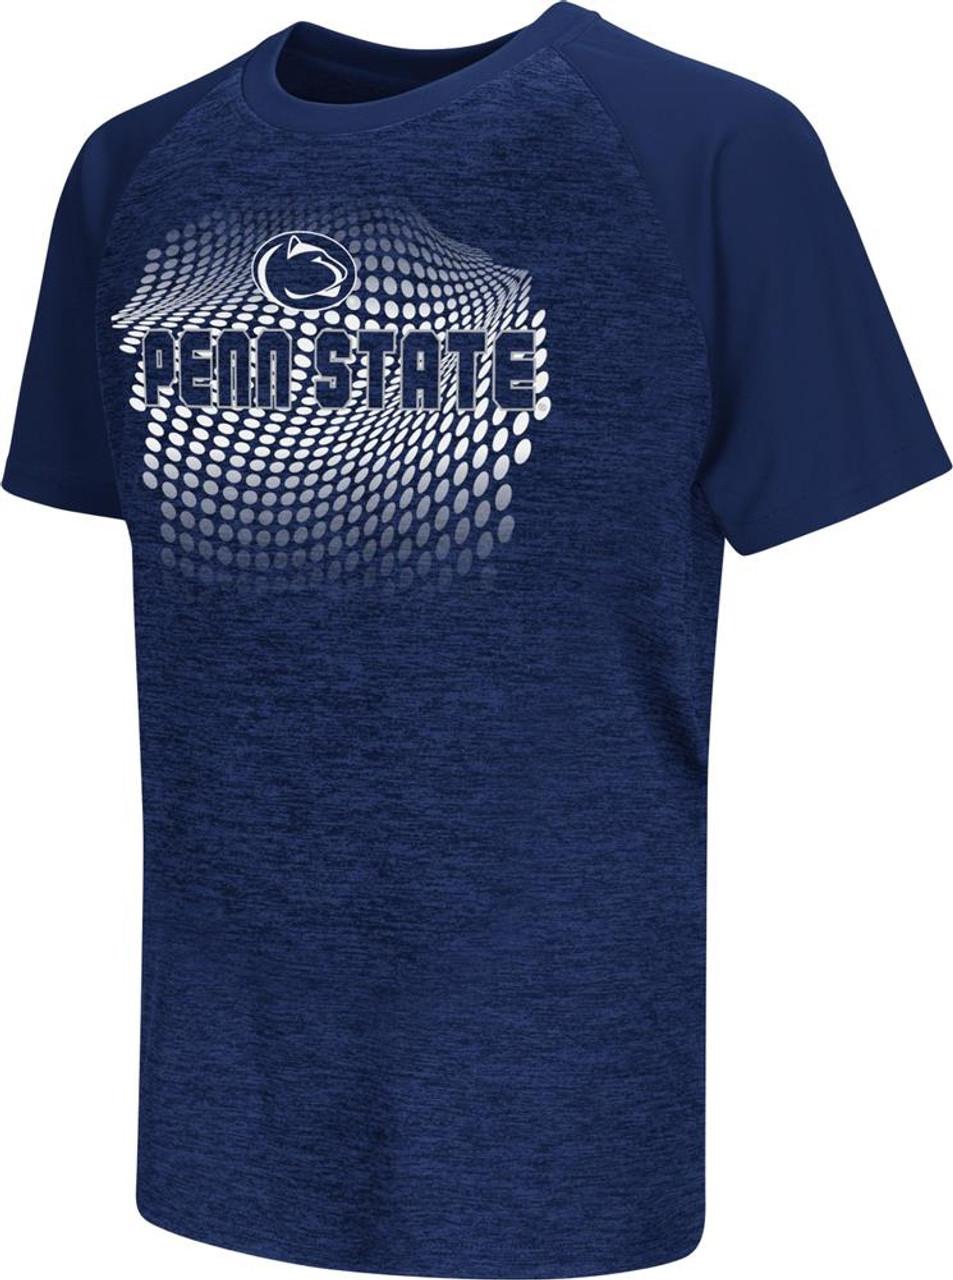 Youth Penn State University Athletic Ryder Short Sleeve Tee